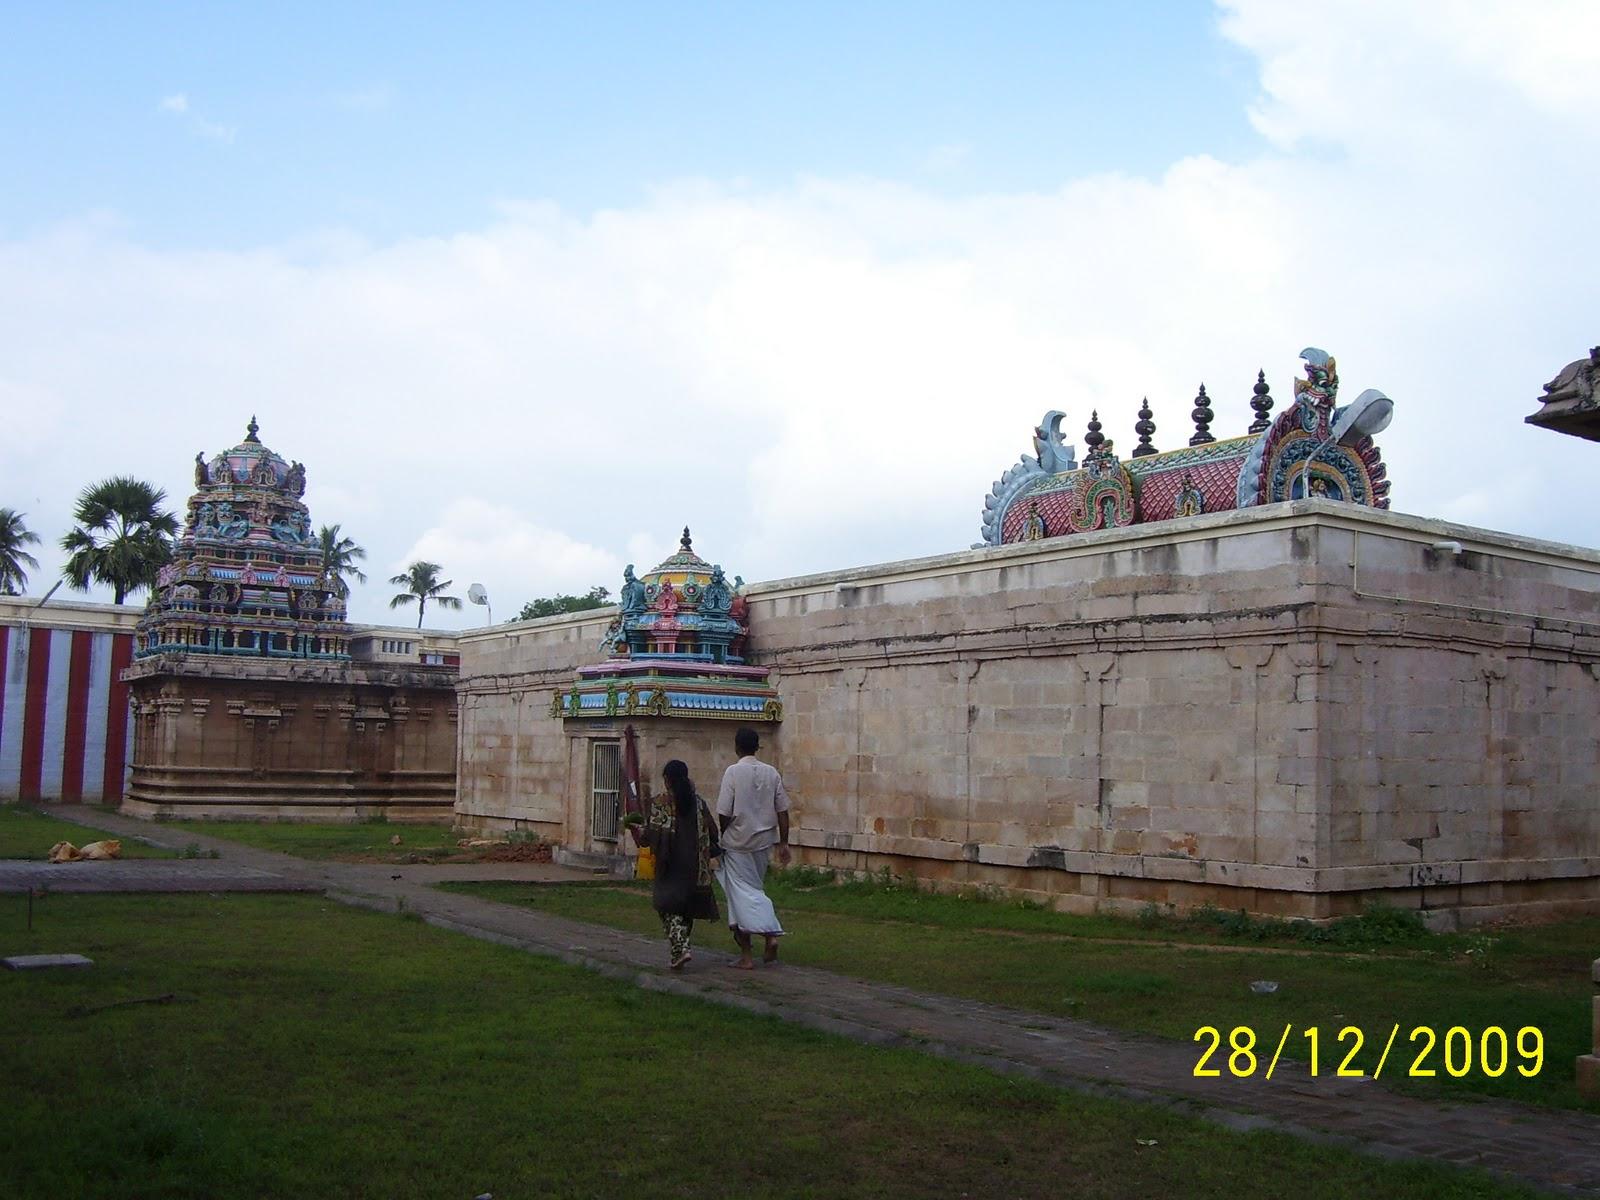 Sri Vaitha Maanidhi Perumal Temple (ThiruKolur) Tirunelveli - Divya Desam 68